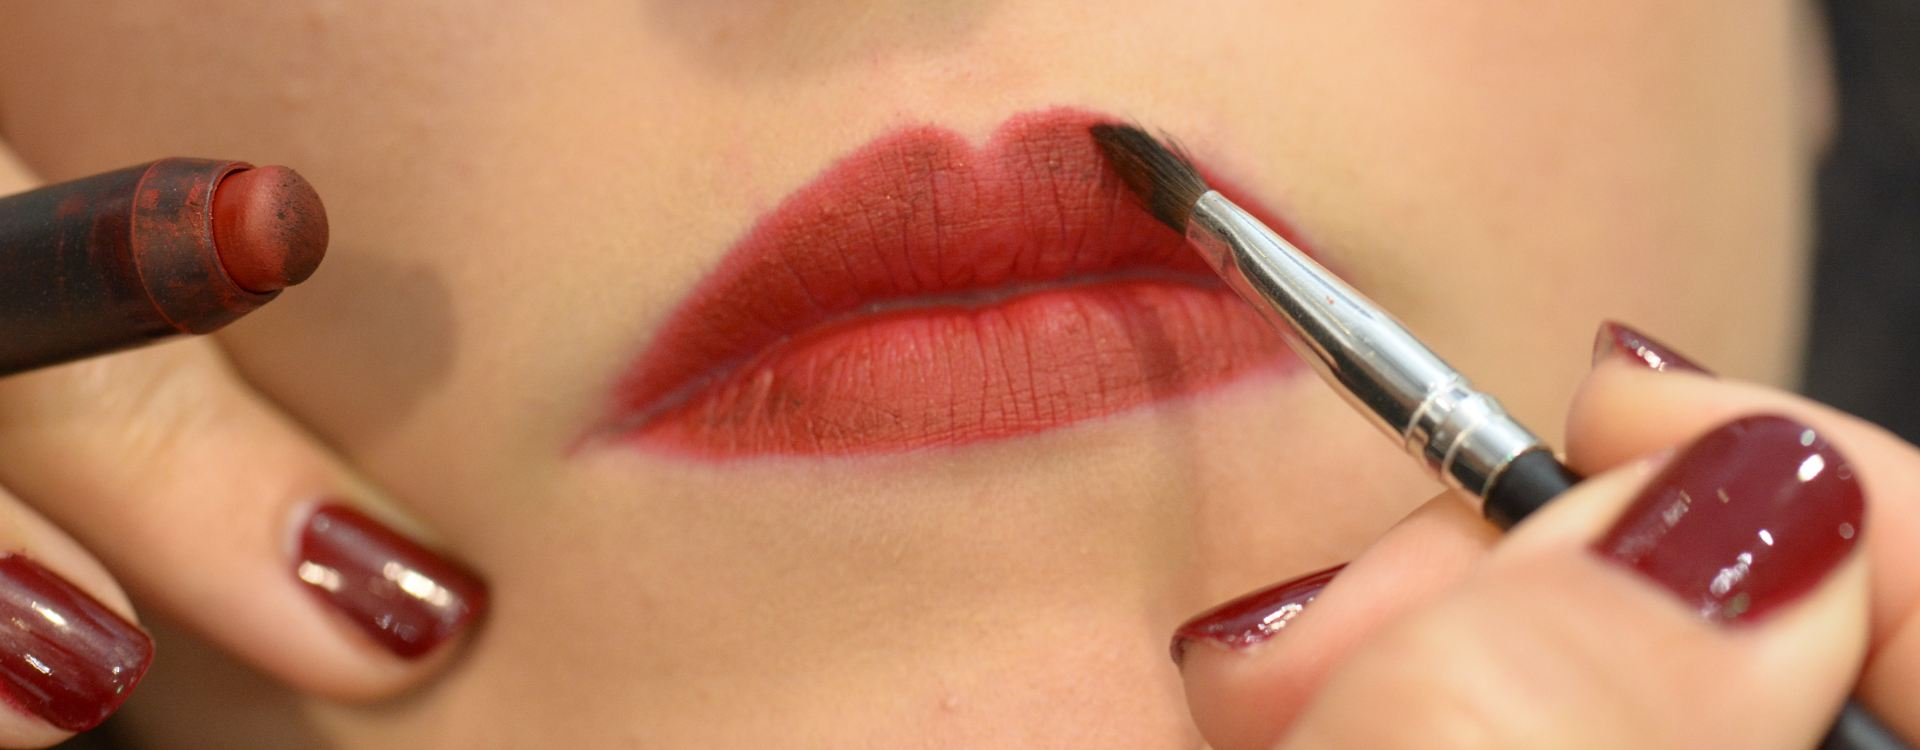 soins esthétique maquillage montpellier